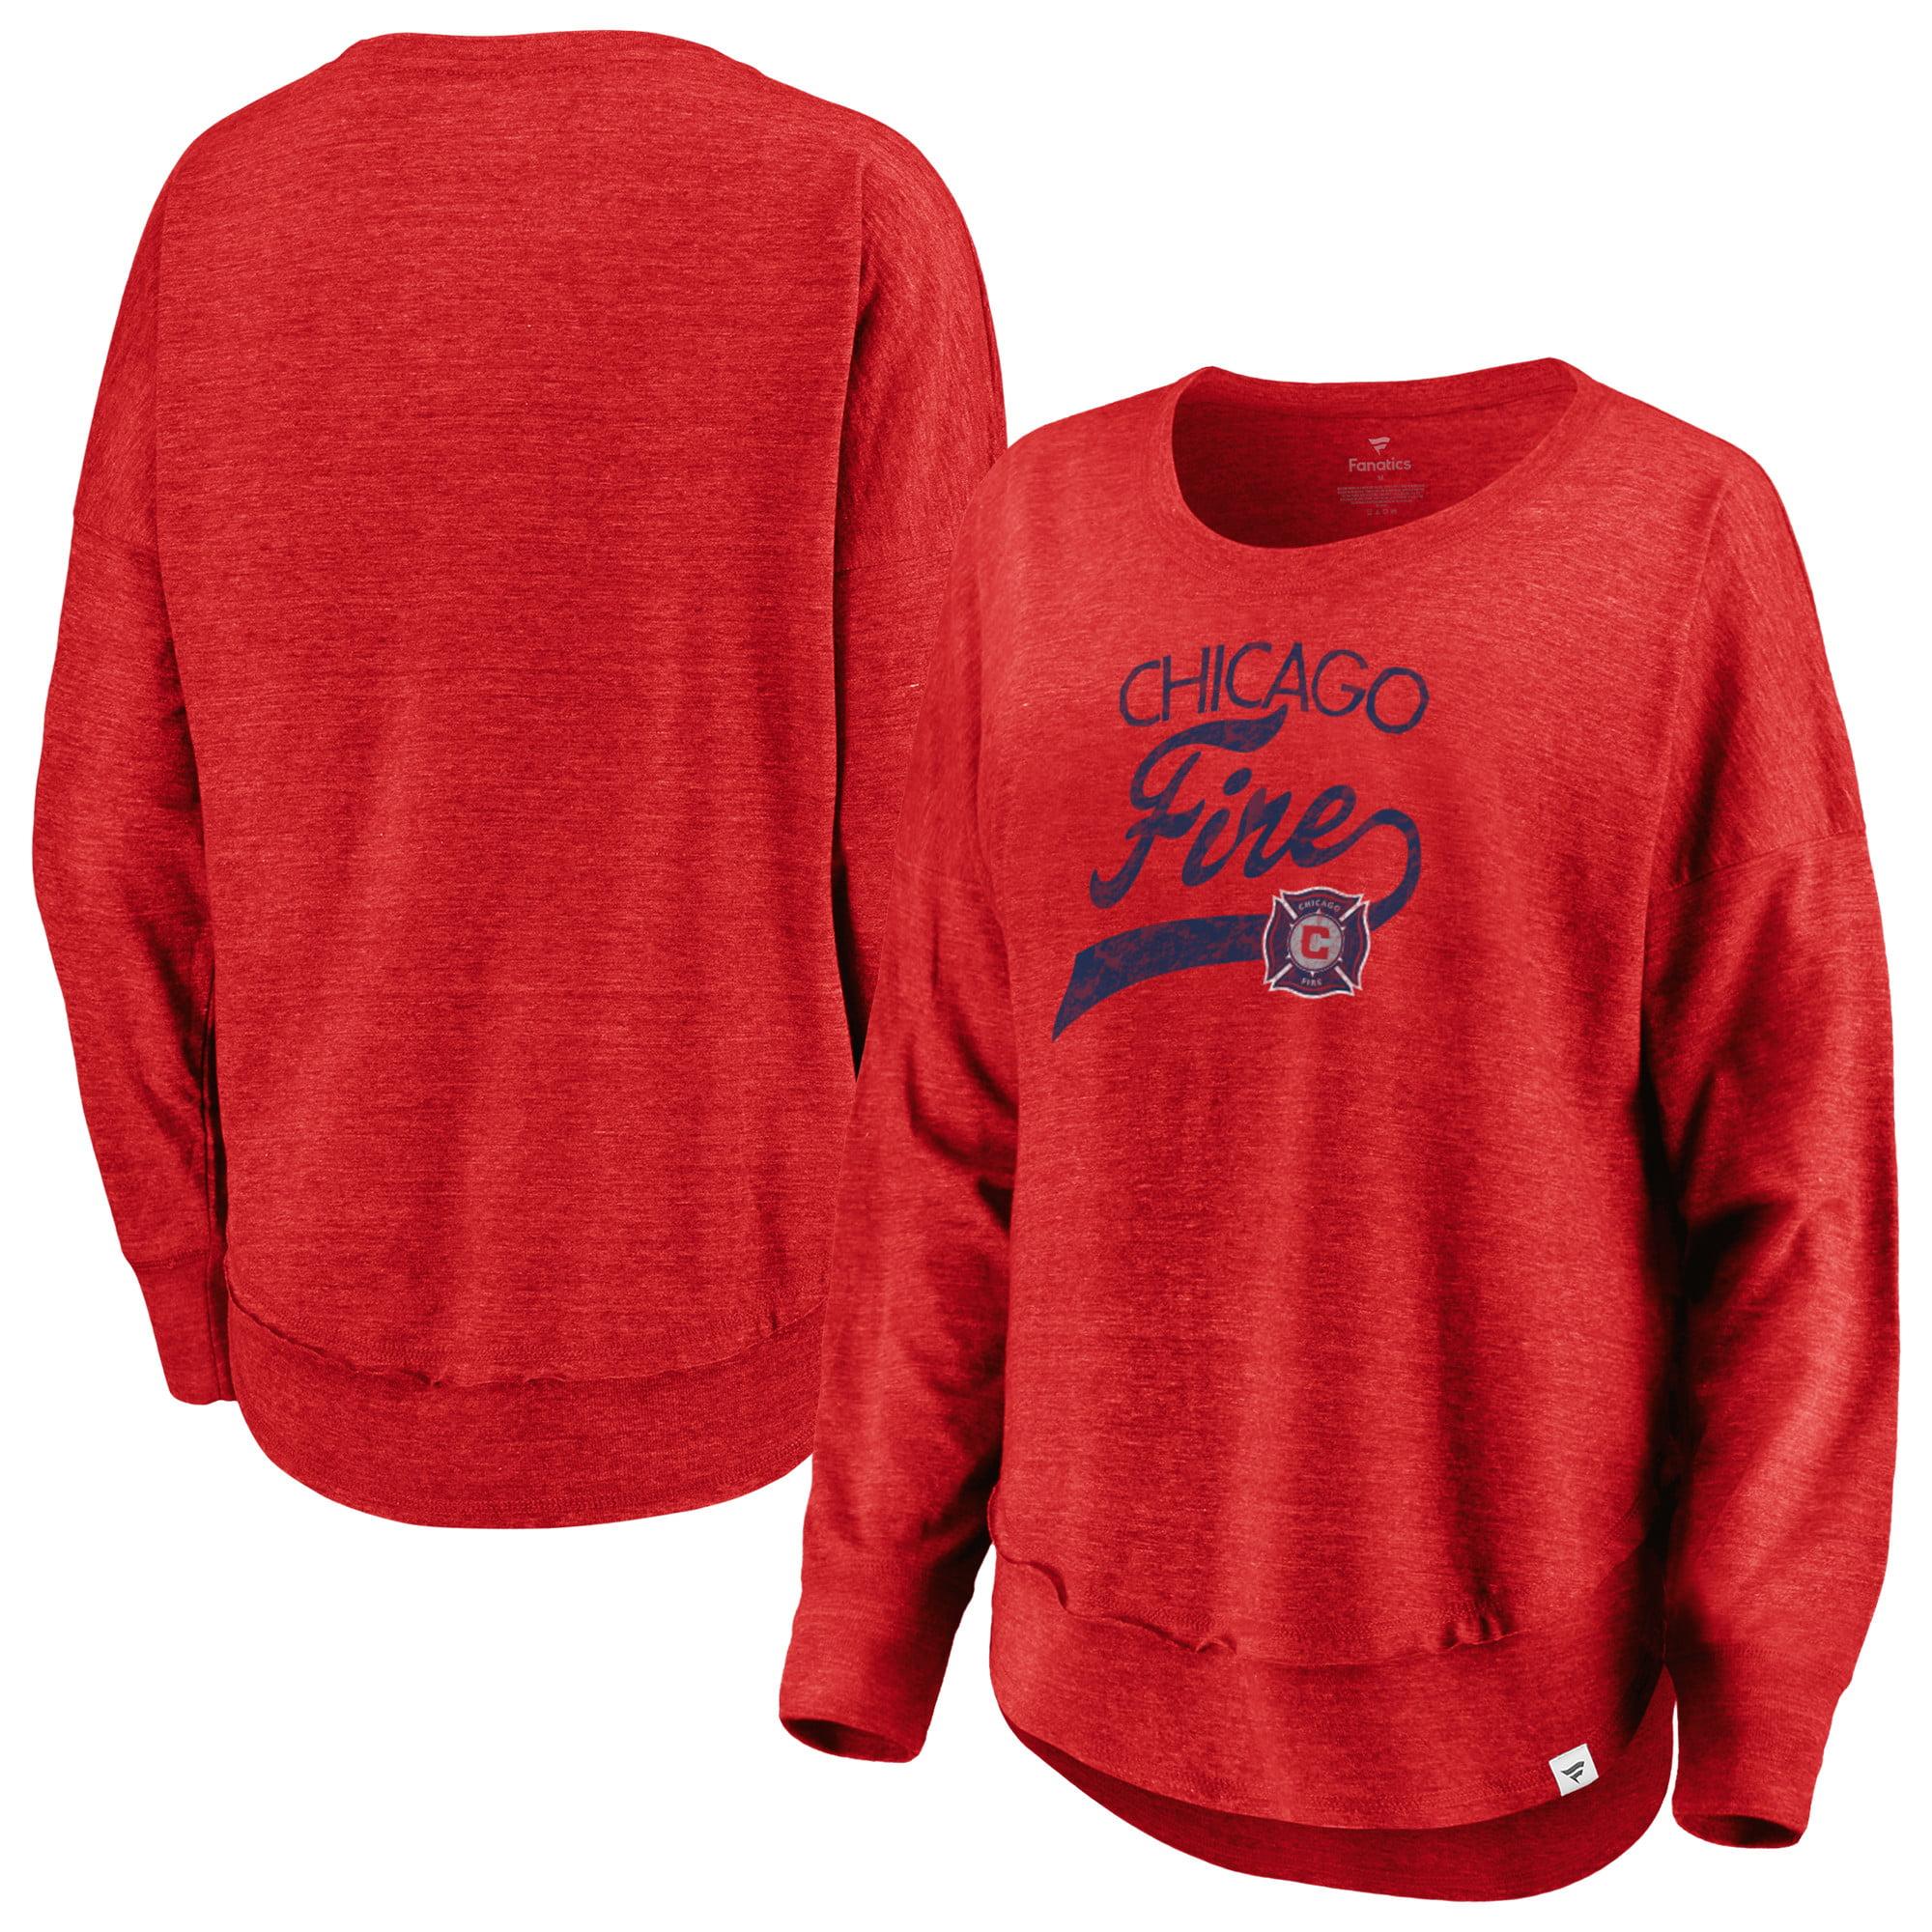 Chicago Fire Fanatics Branded Women's Plus Size True Classics Amaze Long Sleeve Tri-Blend T-Shirt - Heathered Red